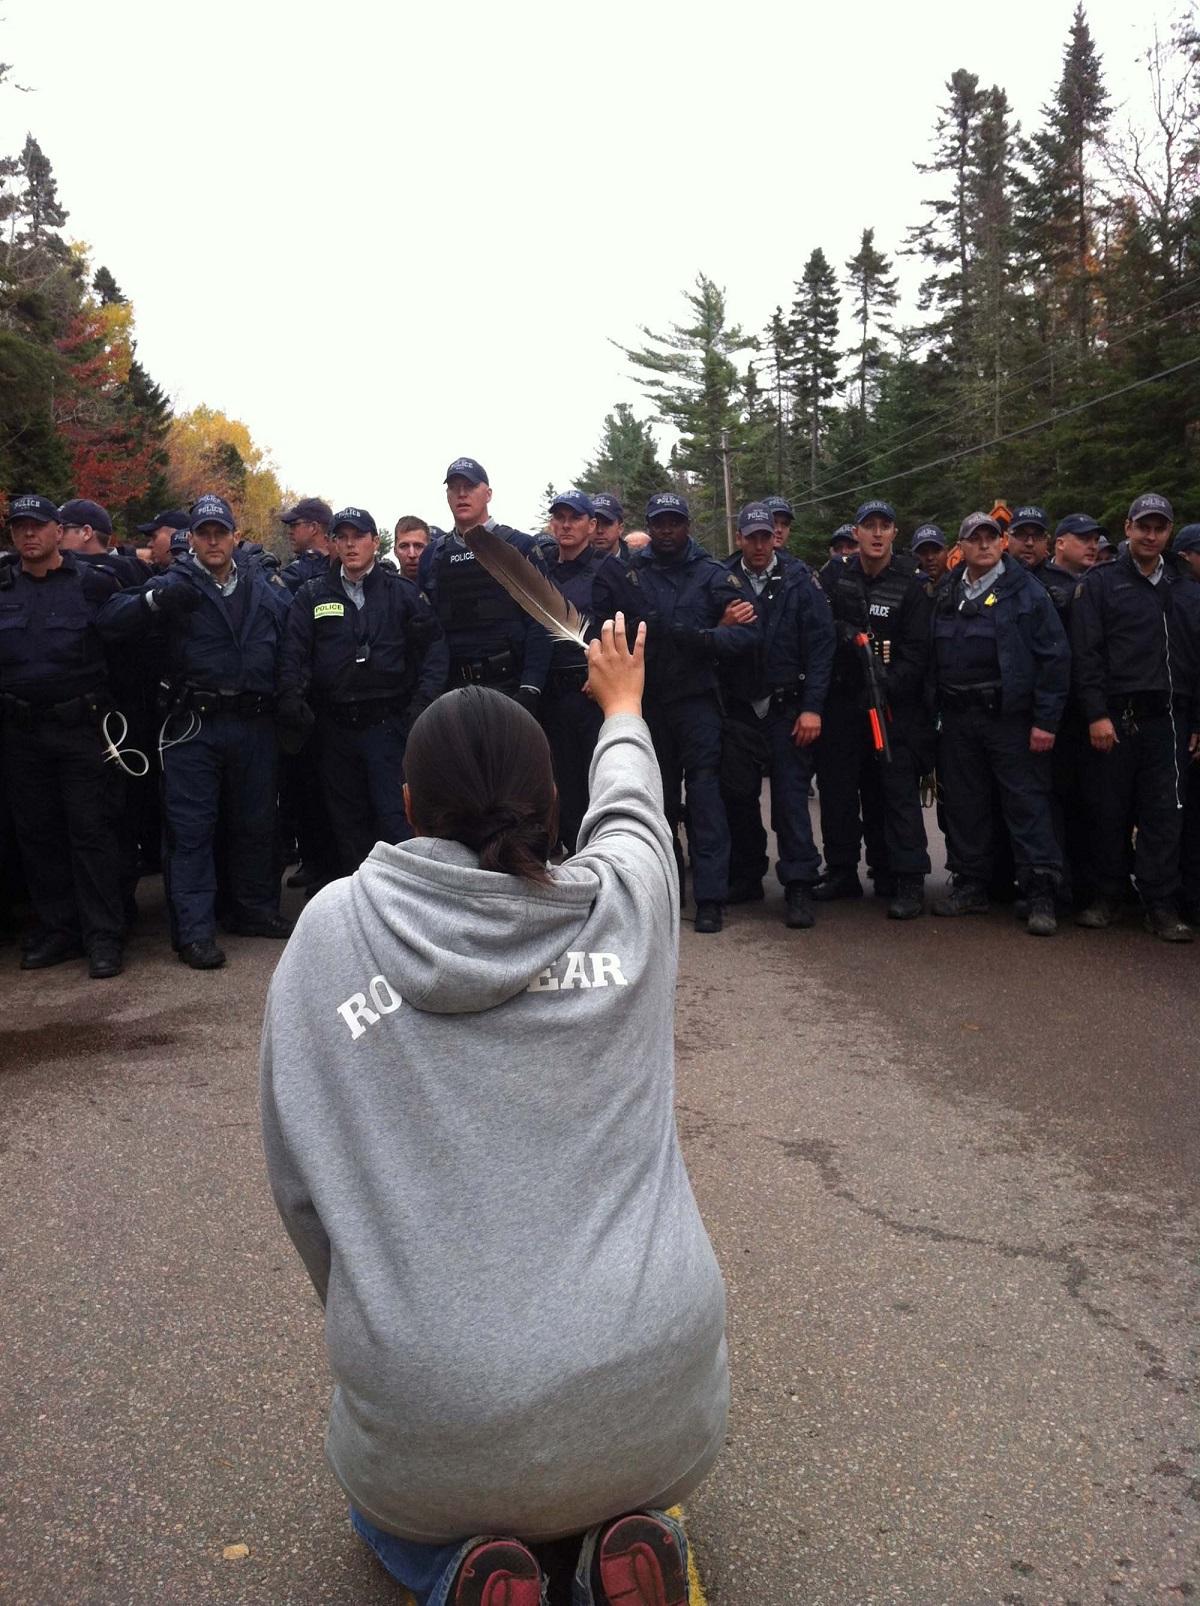 H Amanda Polchies των ιθαγενών της φυλής των Μικμάκ σε διαμαρτυρία κατά της εξόρυξης στην γη που τους ανήκει. Στο New Brunswick του Καναδά, το 2013. Φωτογράφος: Ossie Michelin